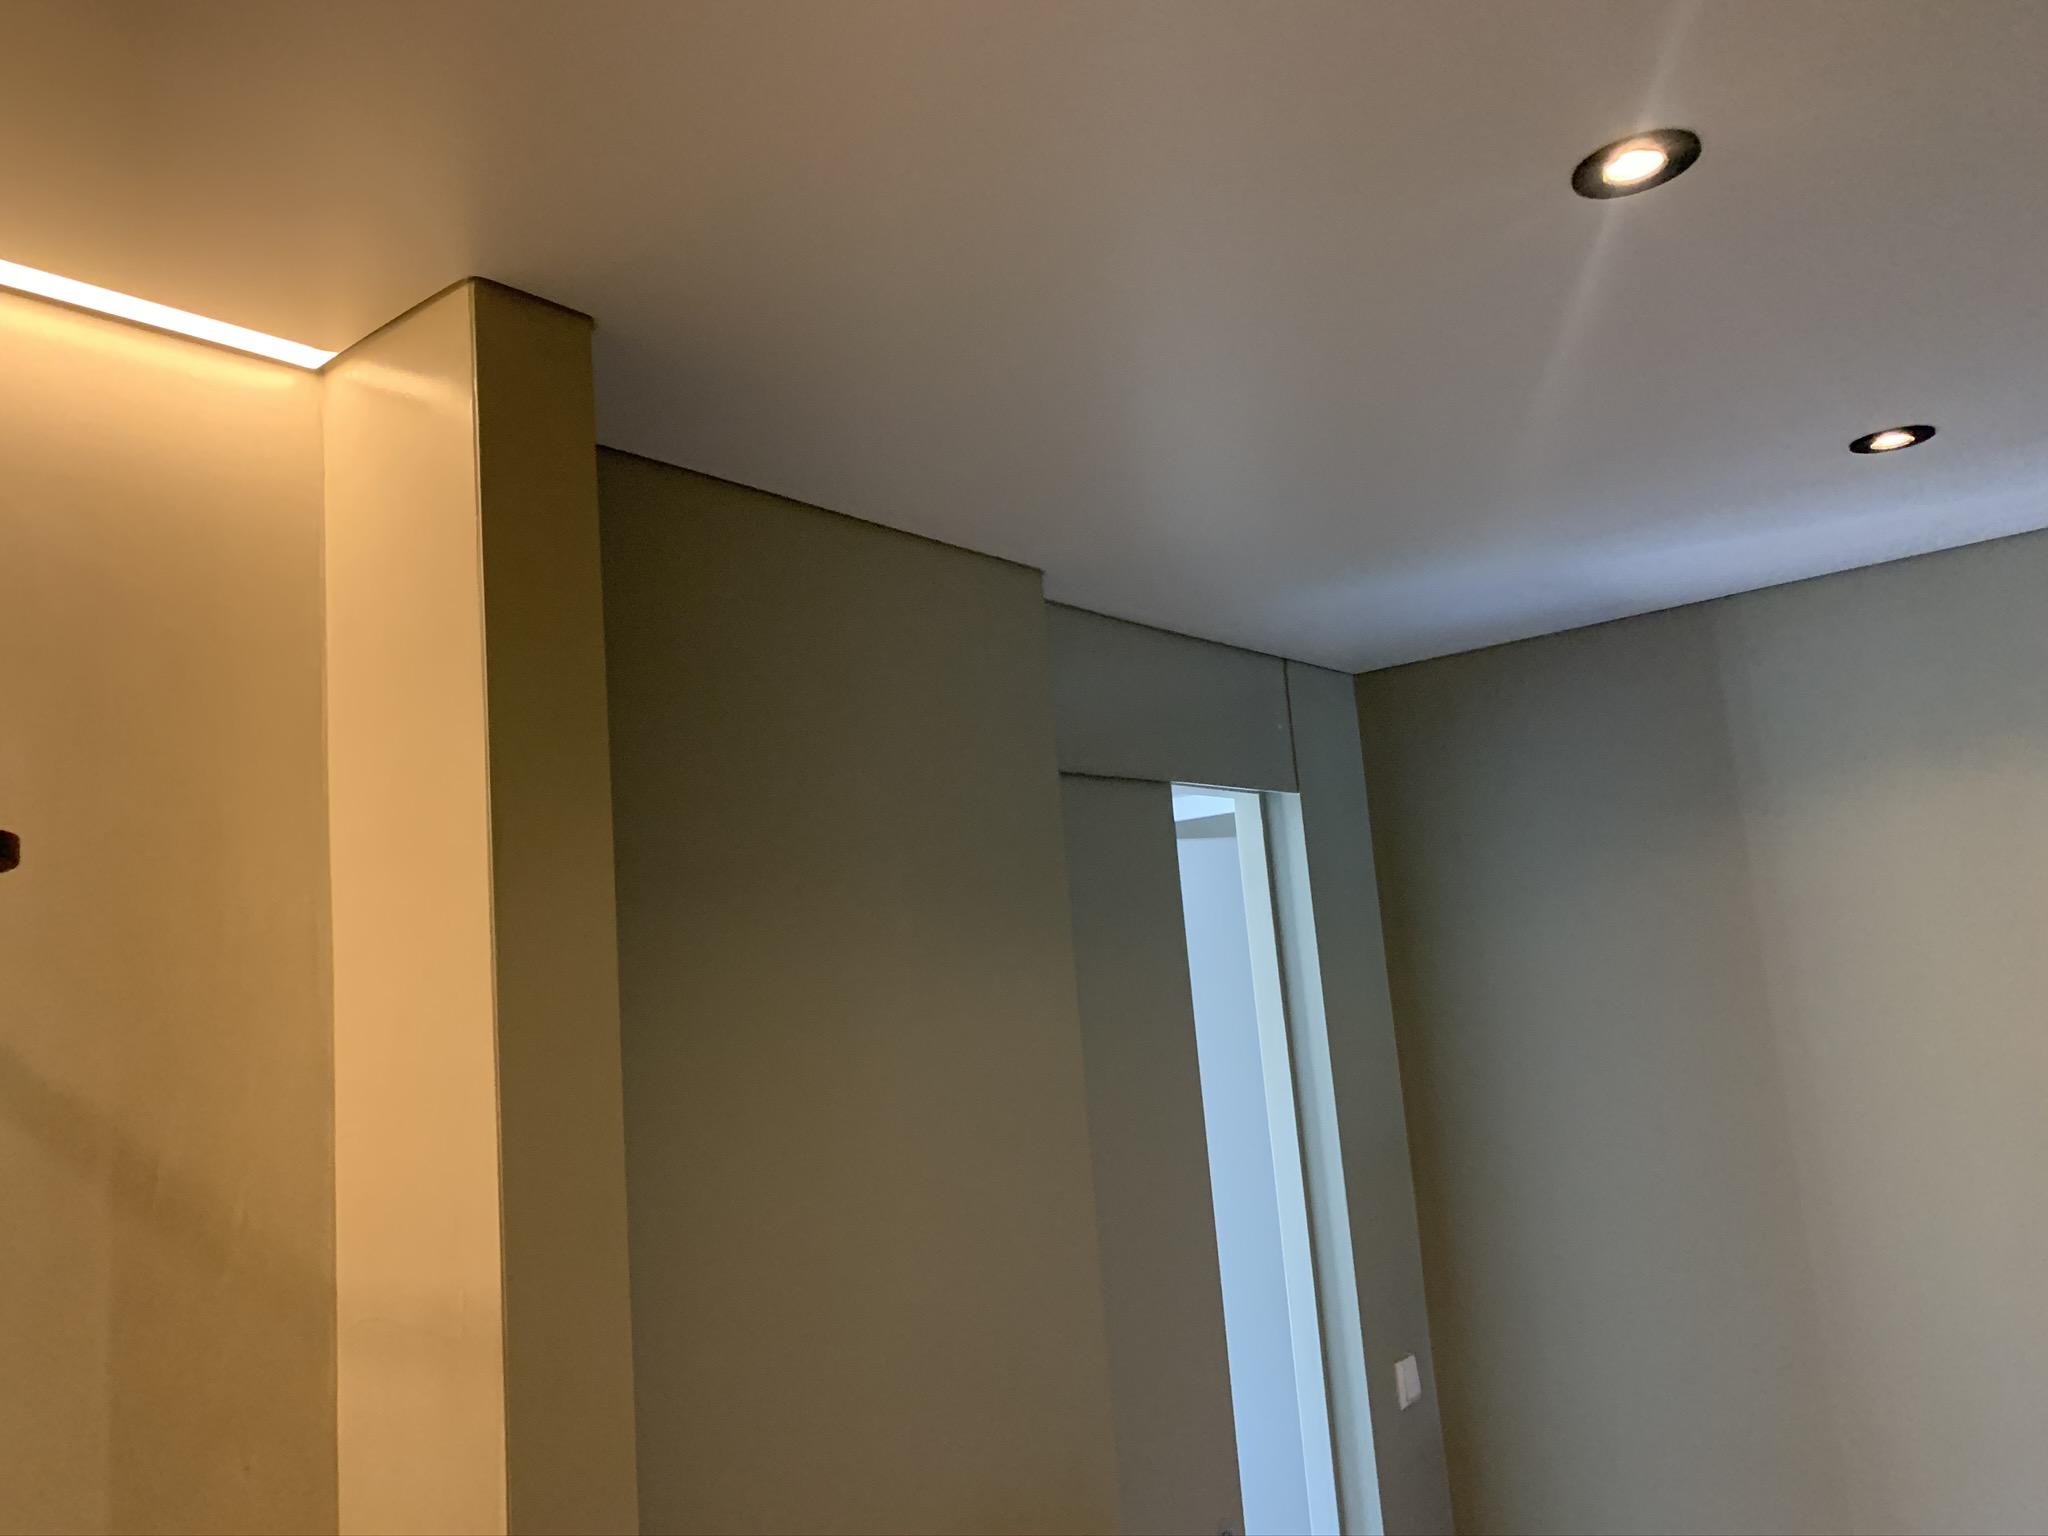 badkamer met spanplafond en mooie sfeerverlichting